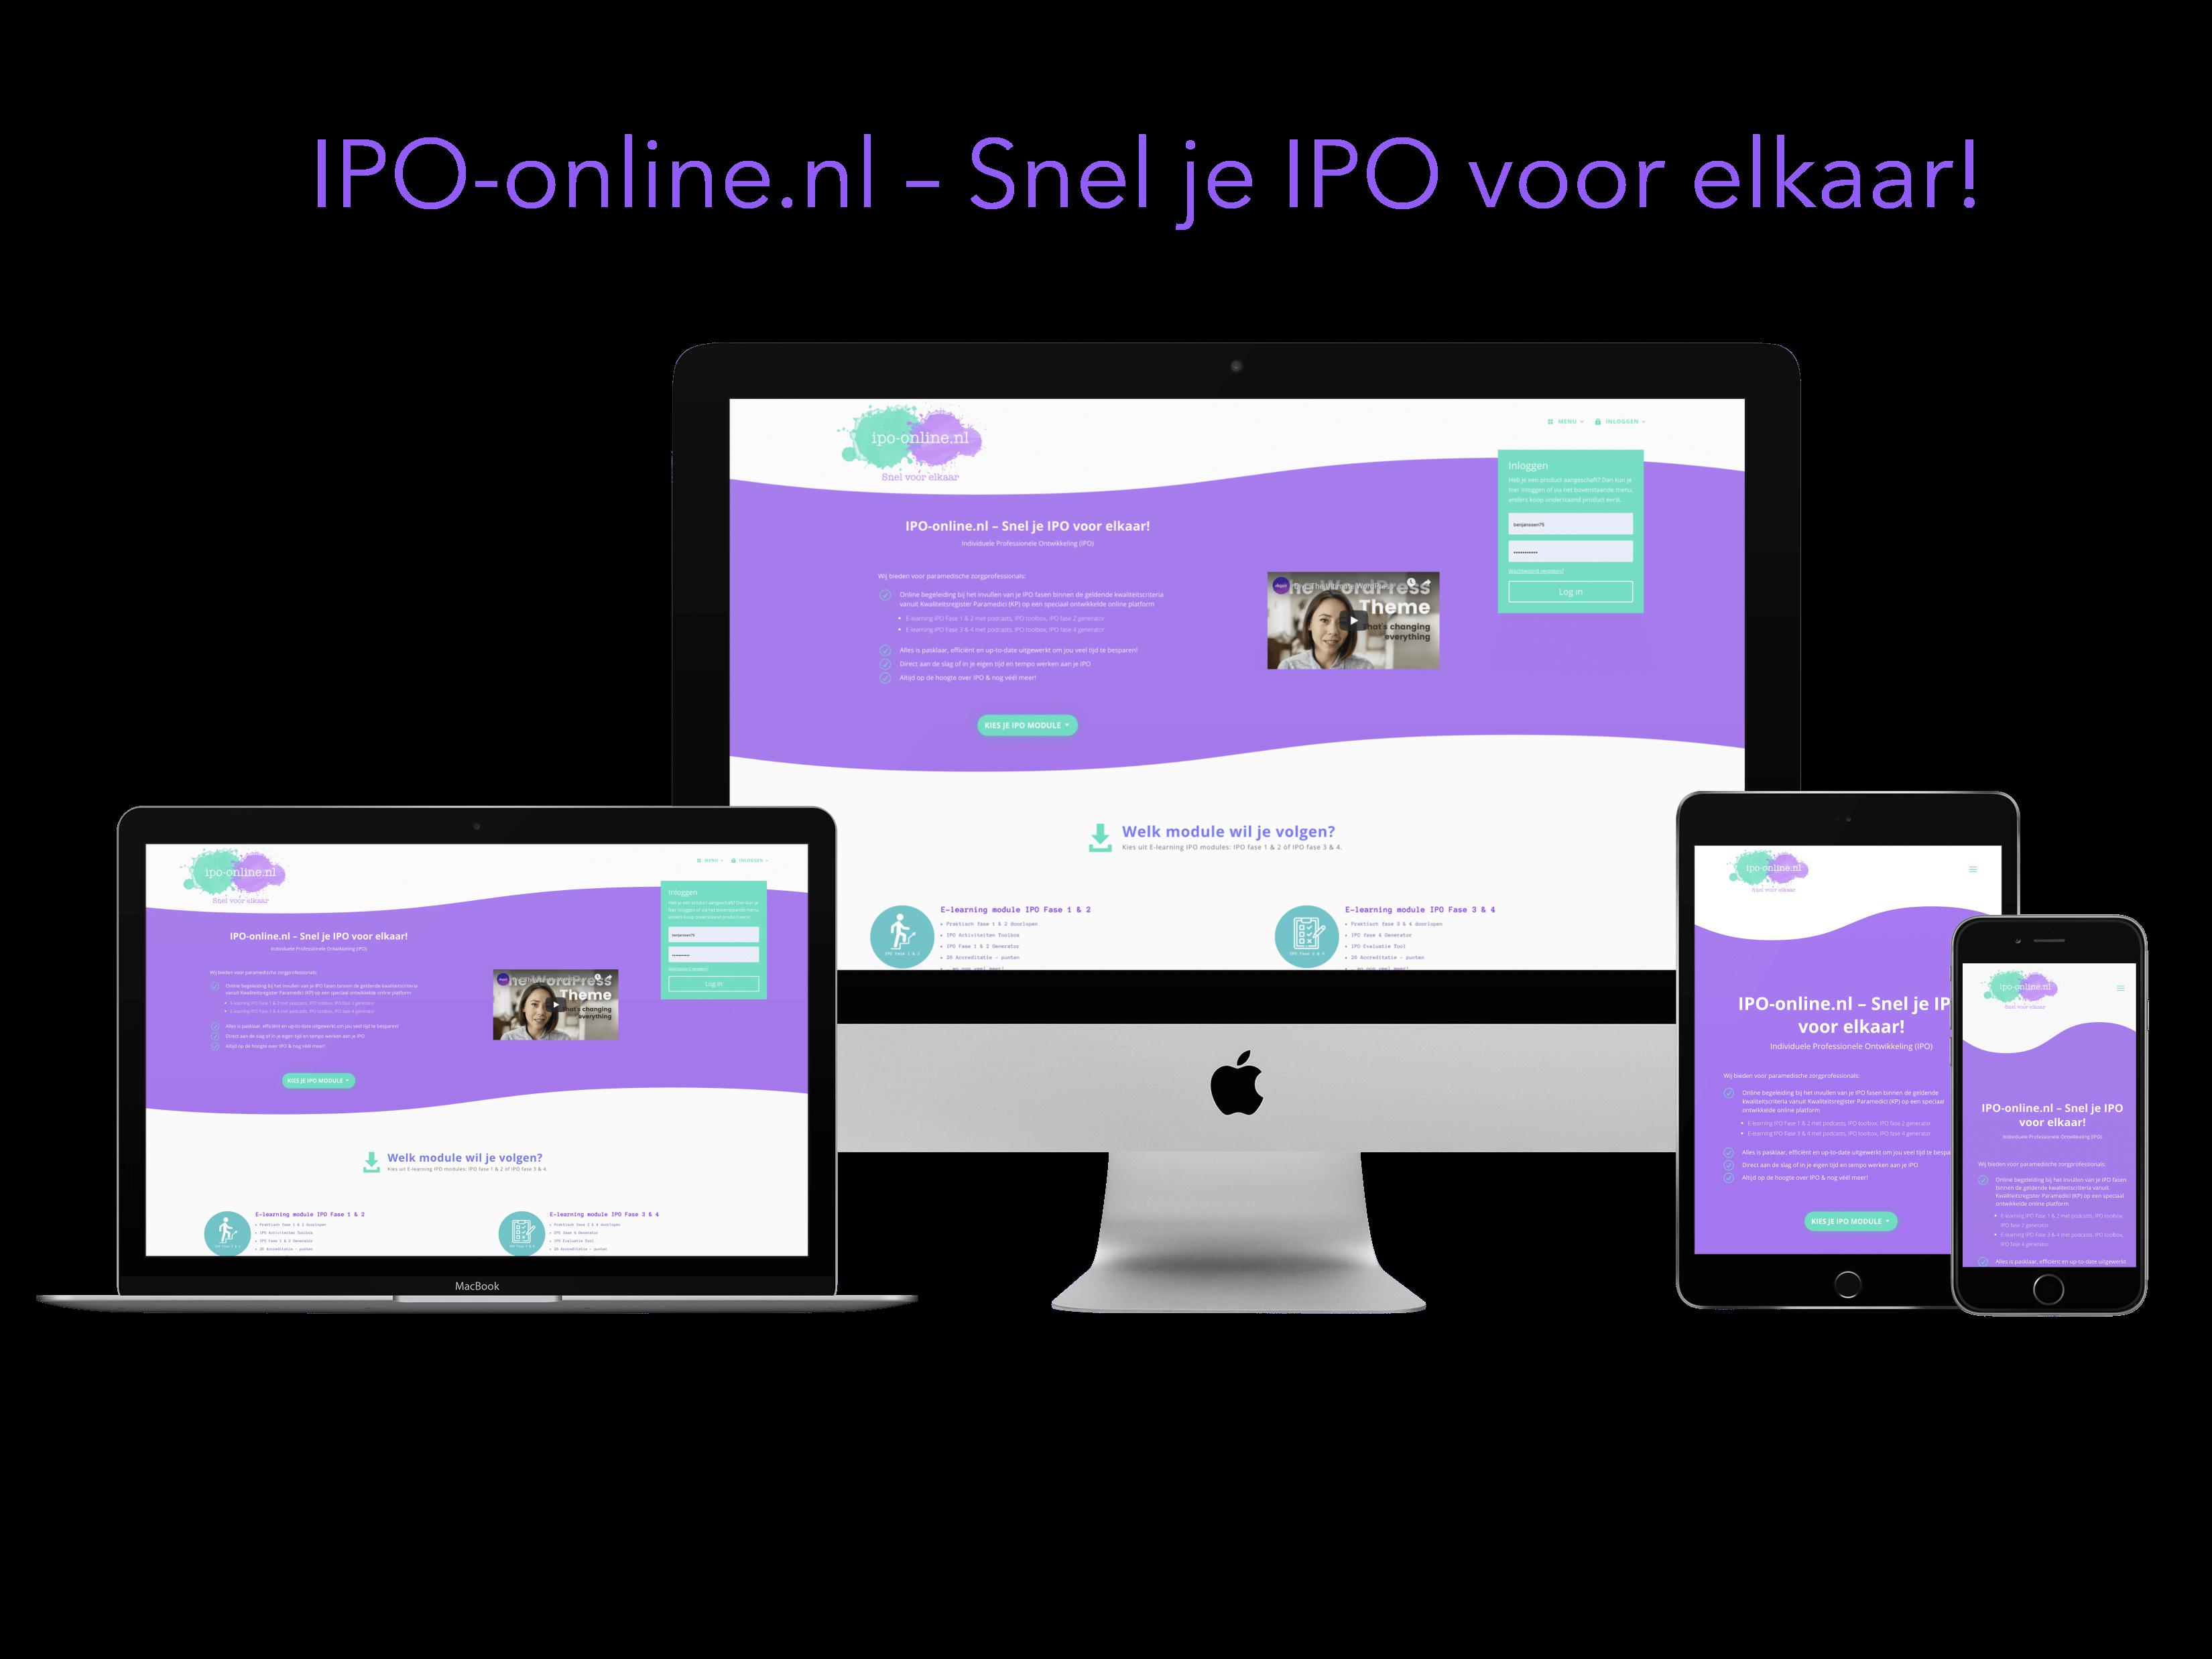 Lancering ipo-online.nl - IPO scholing 1